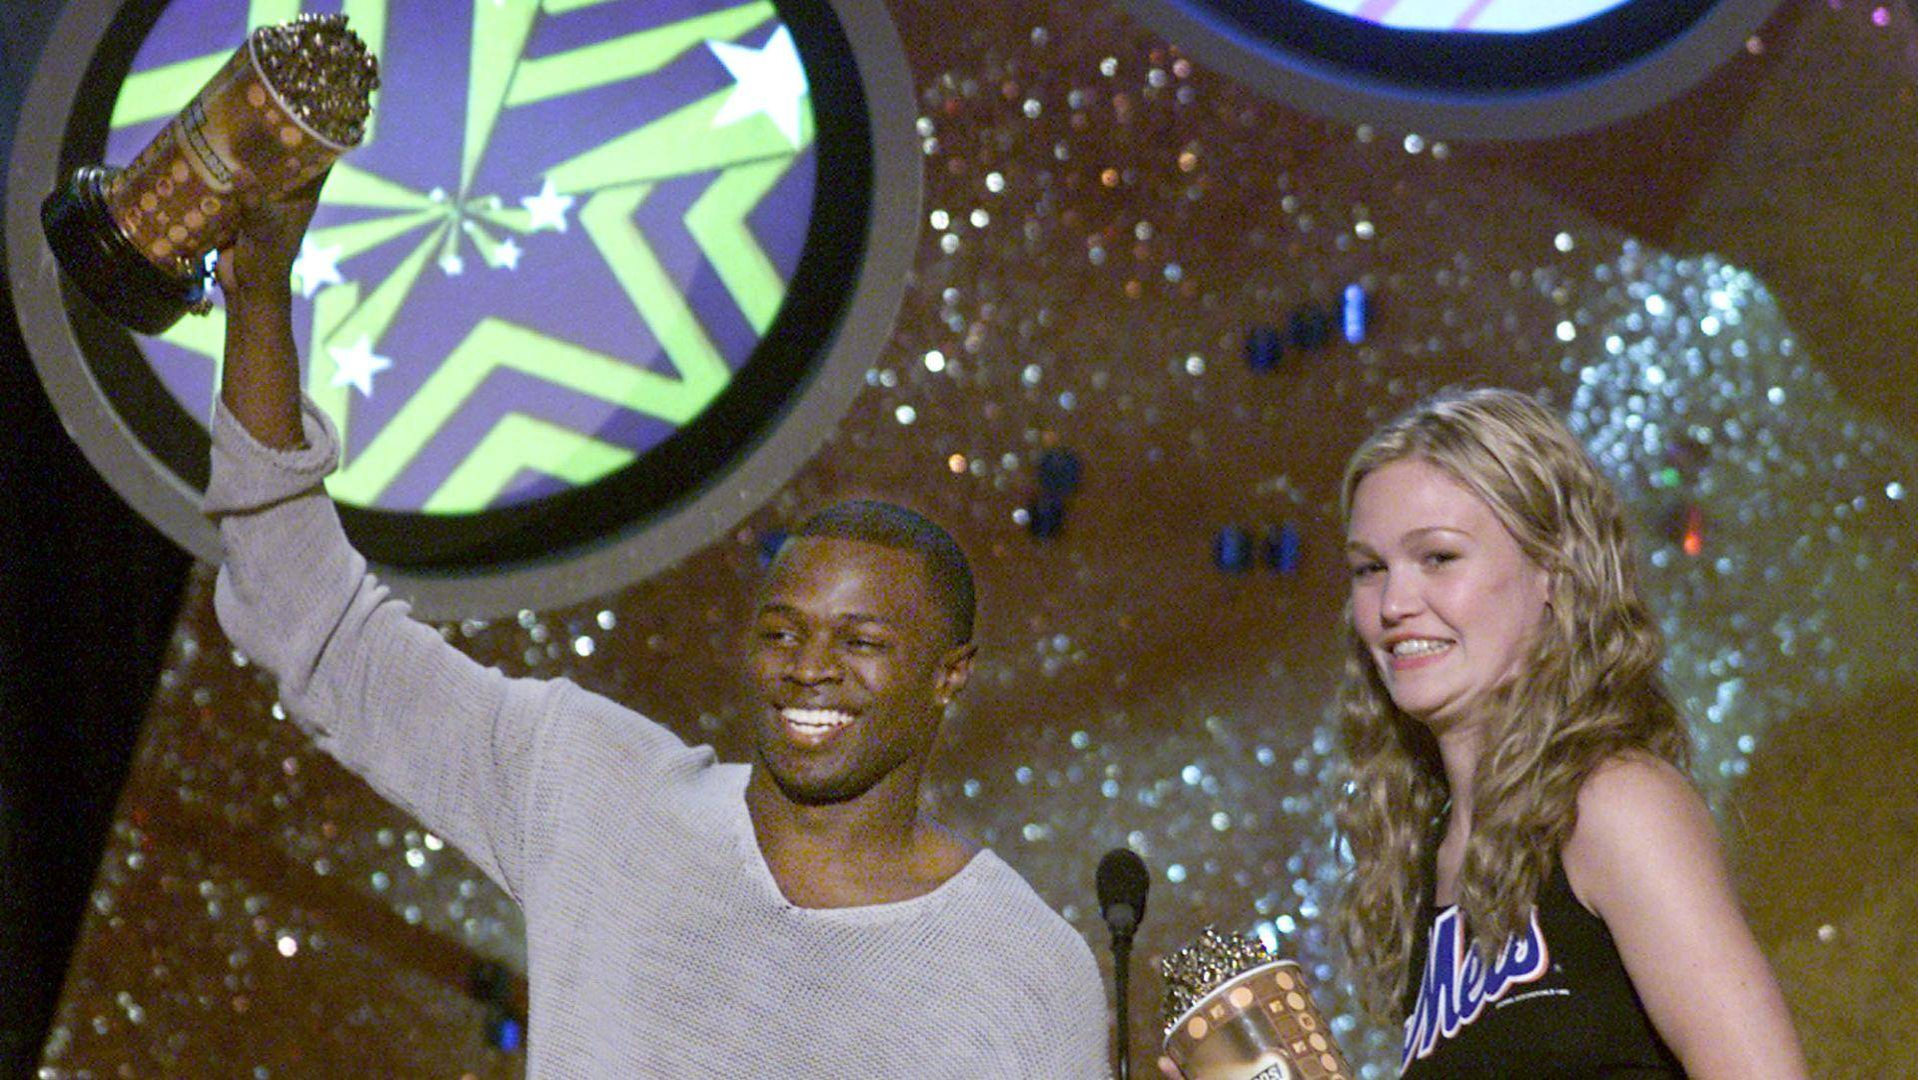 Sean Patrick Thomas e Julia Stiles (Save the Last Dance), foto: Getty Images